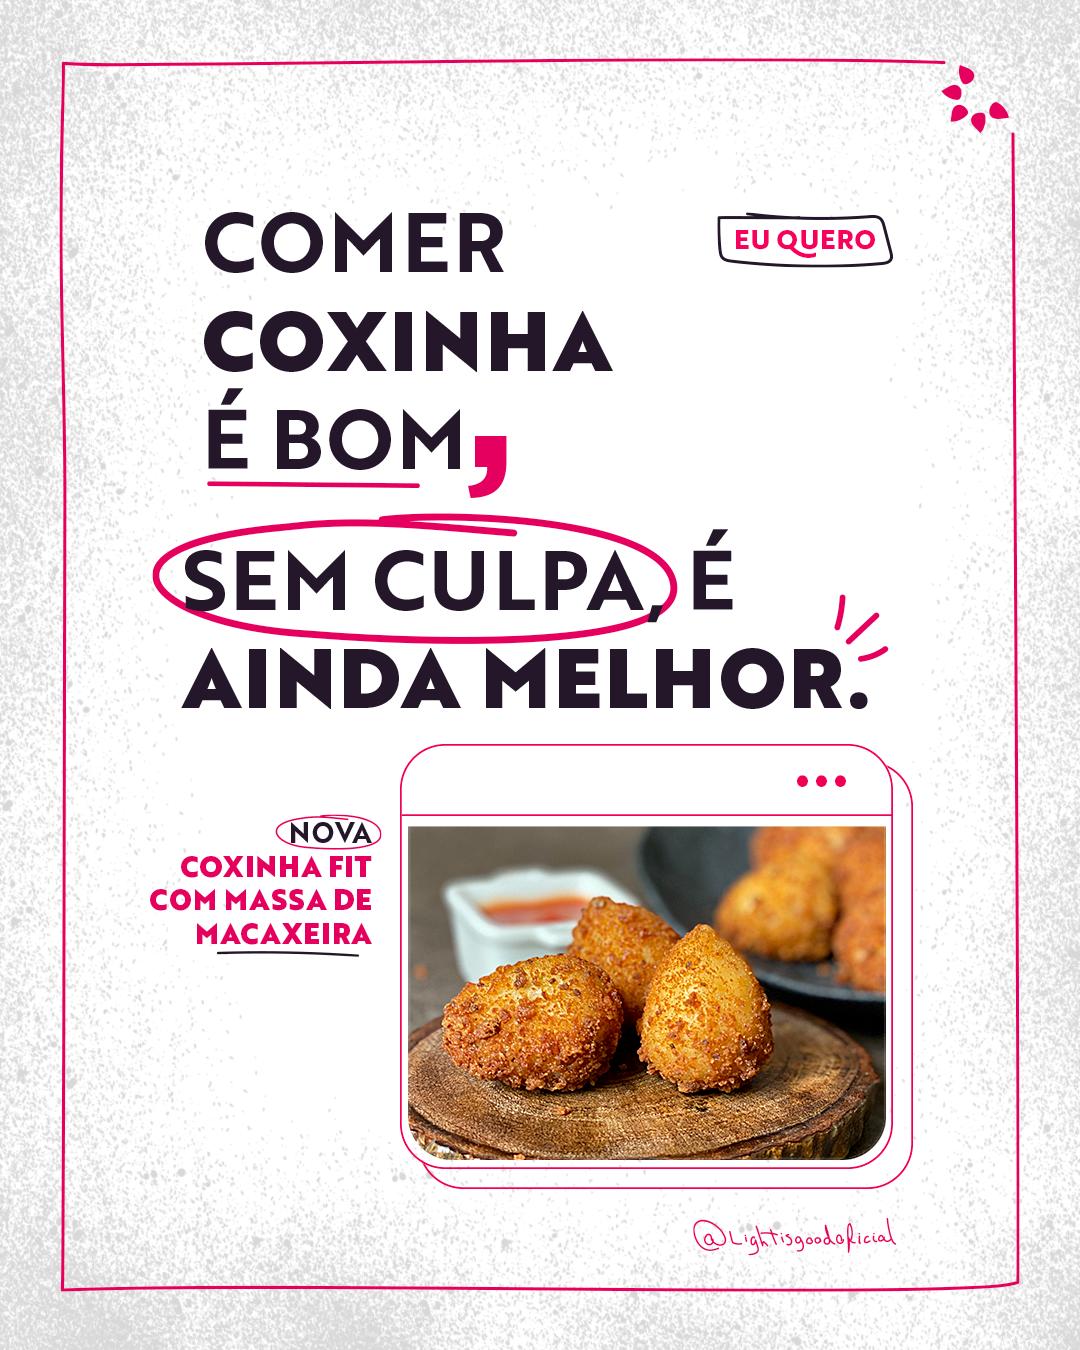 Coxinha Fit Light is Good